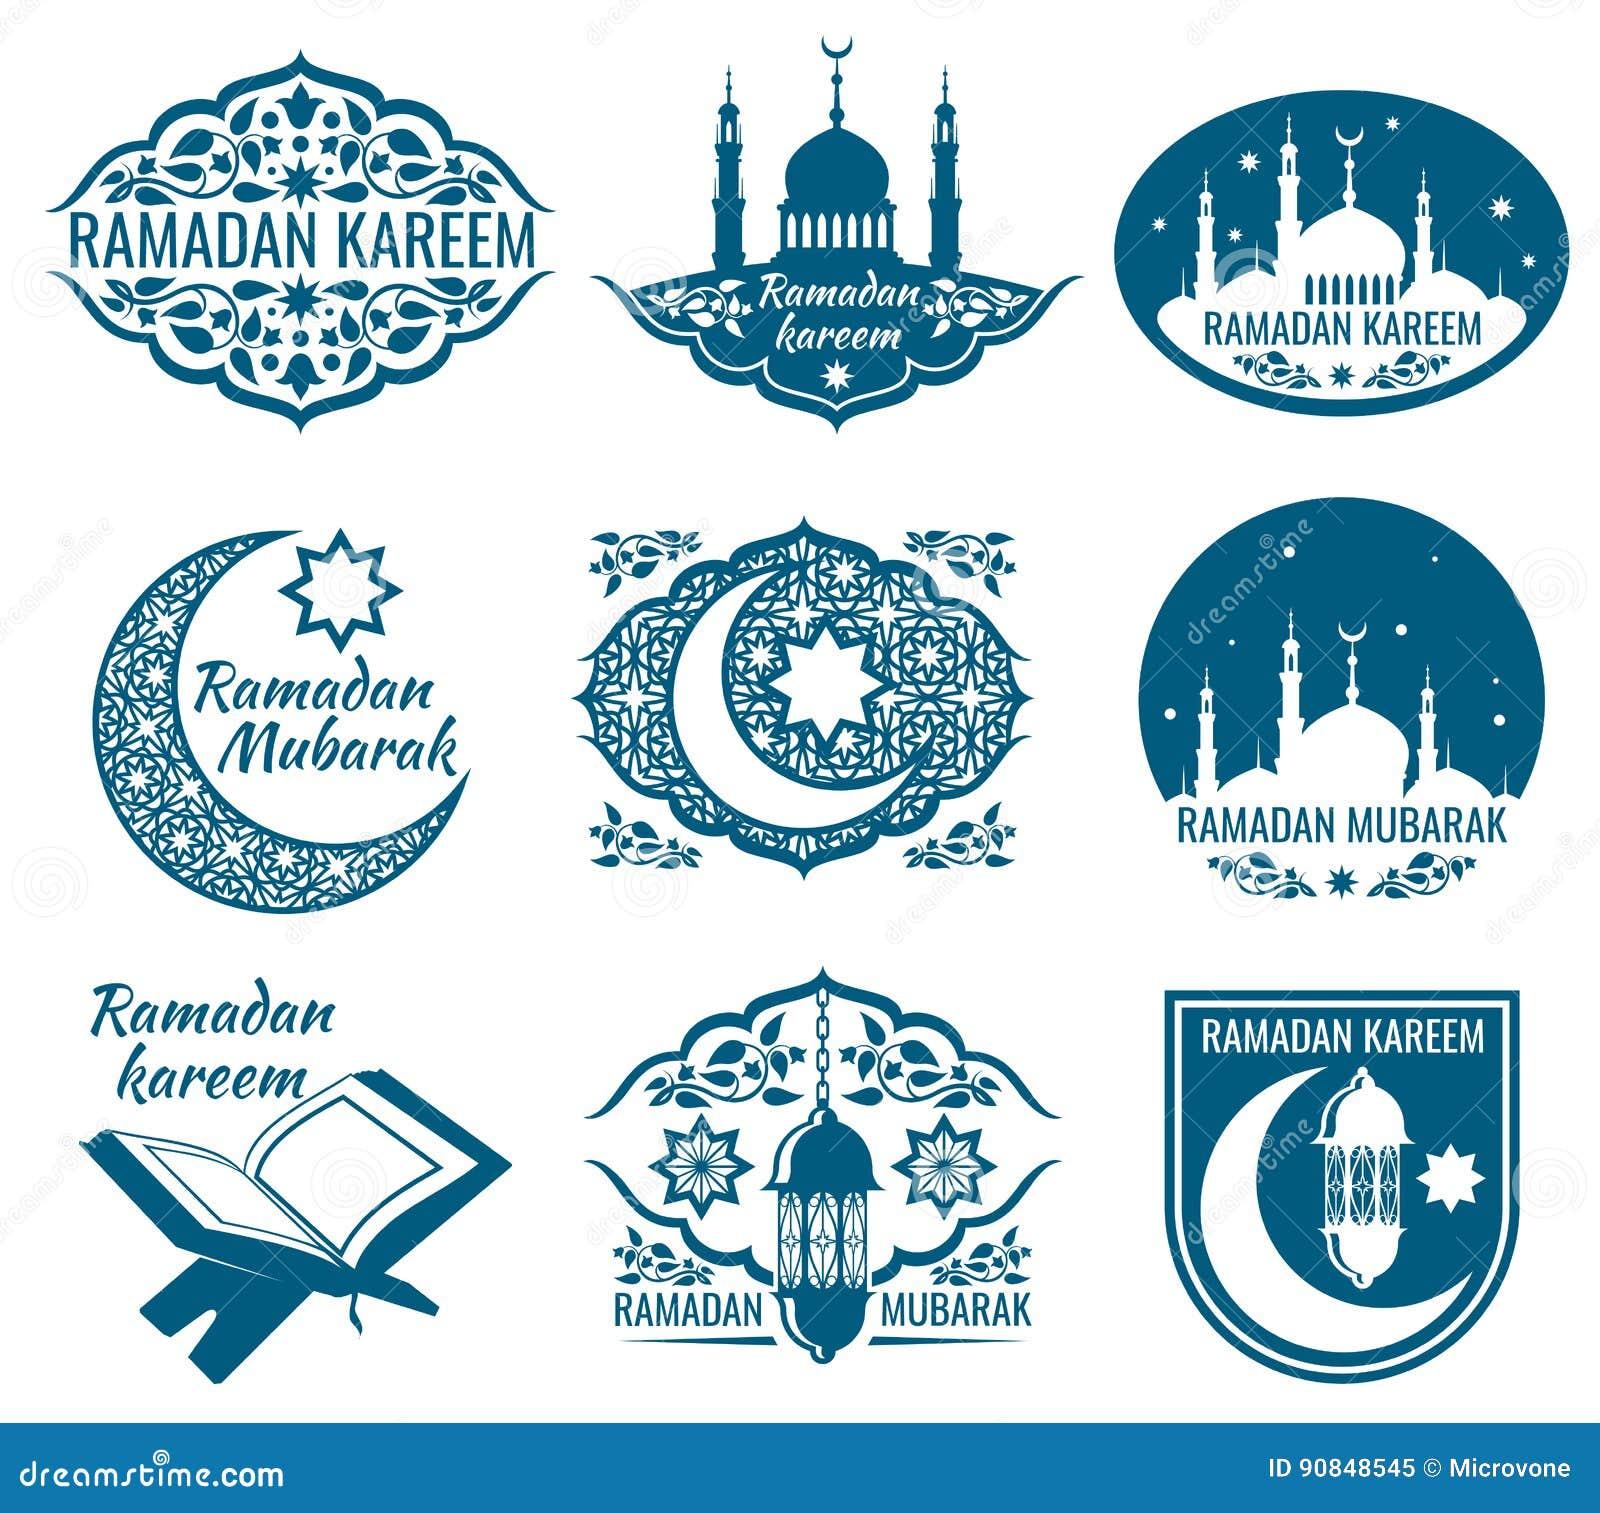 Ramadan Kareem Vector Labels Vintage Badges With Arabian